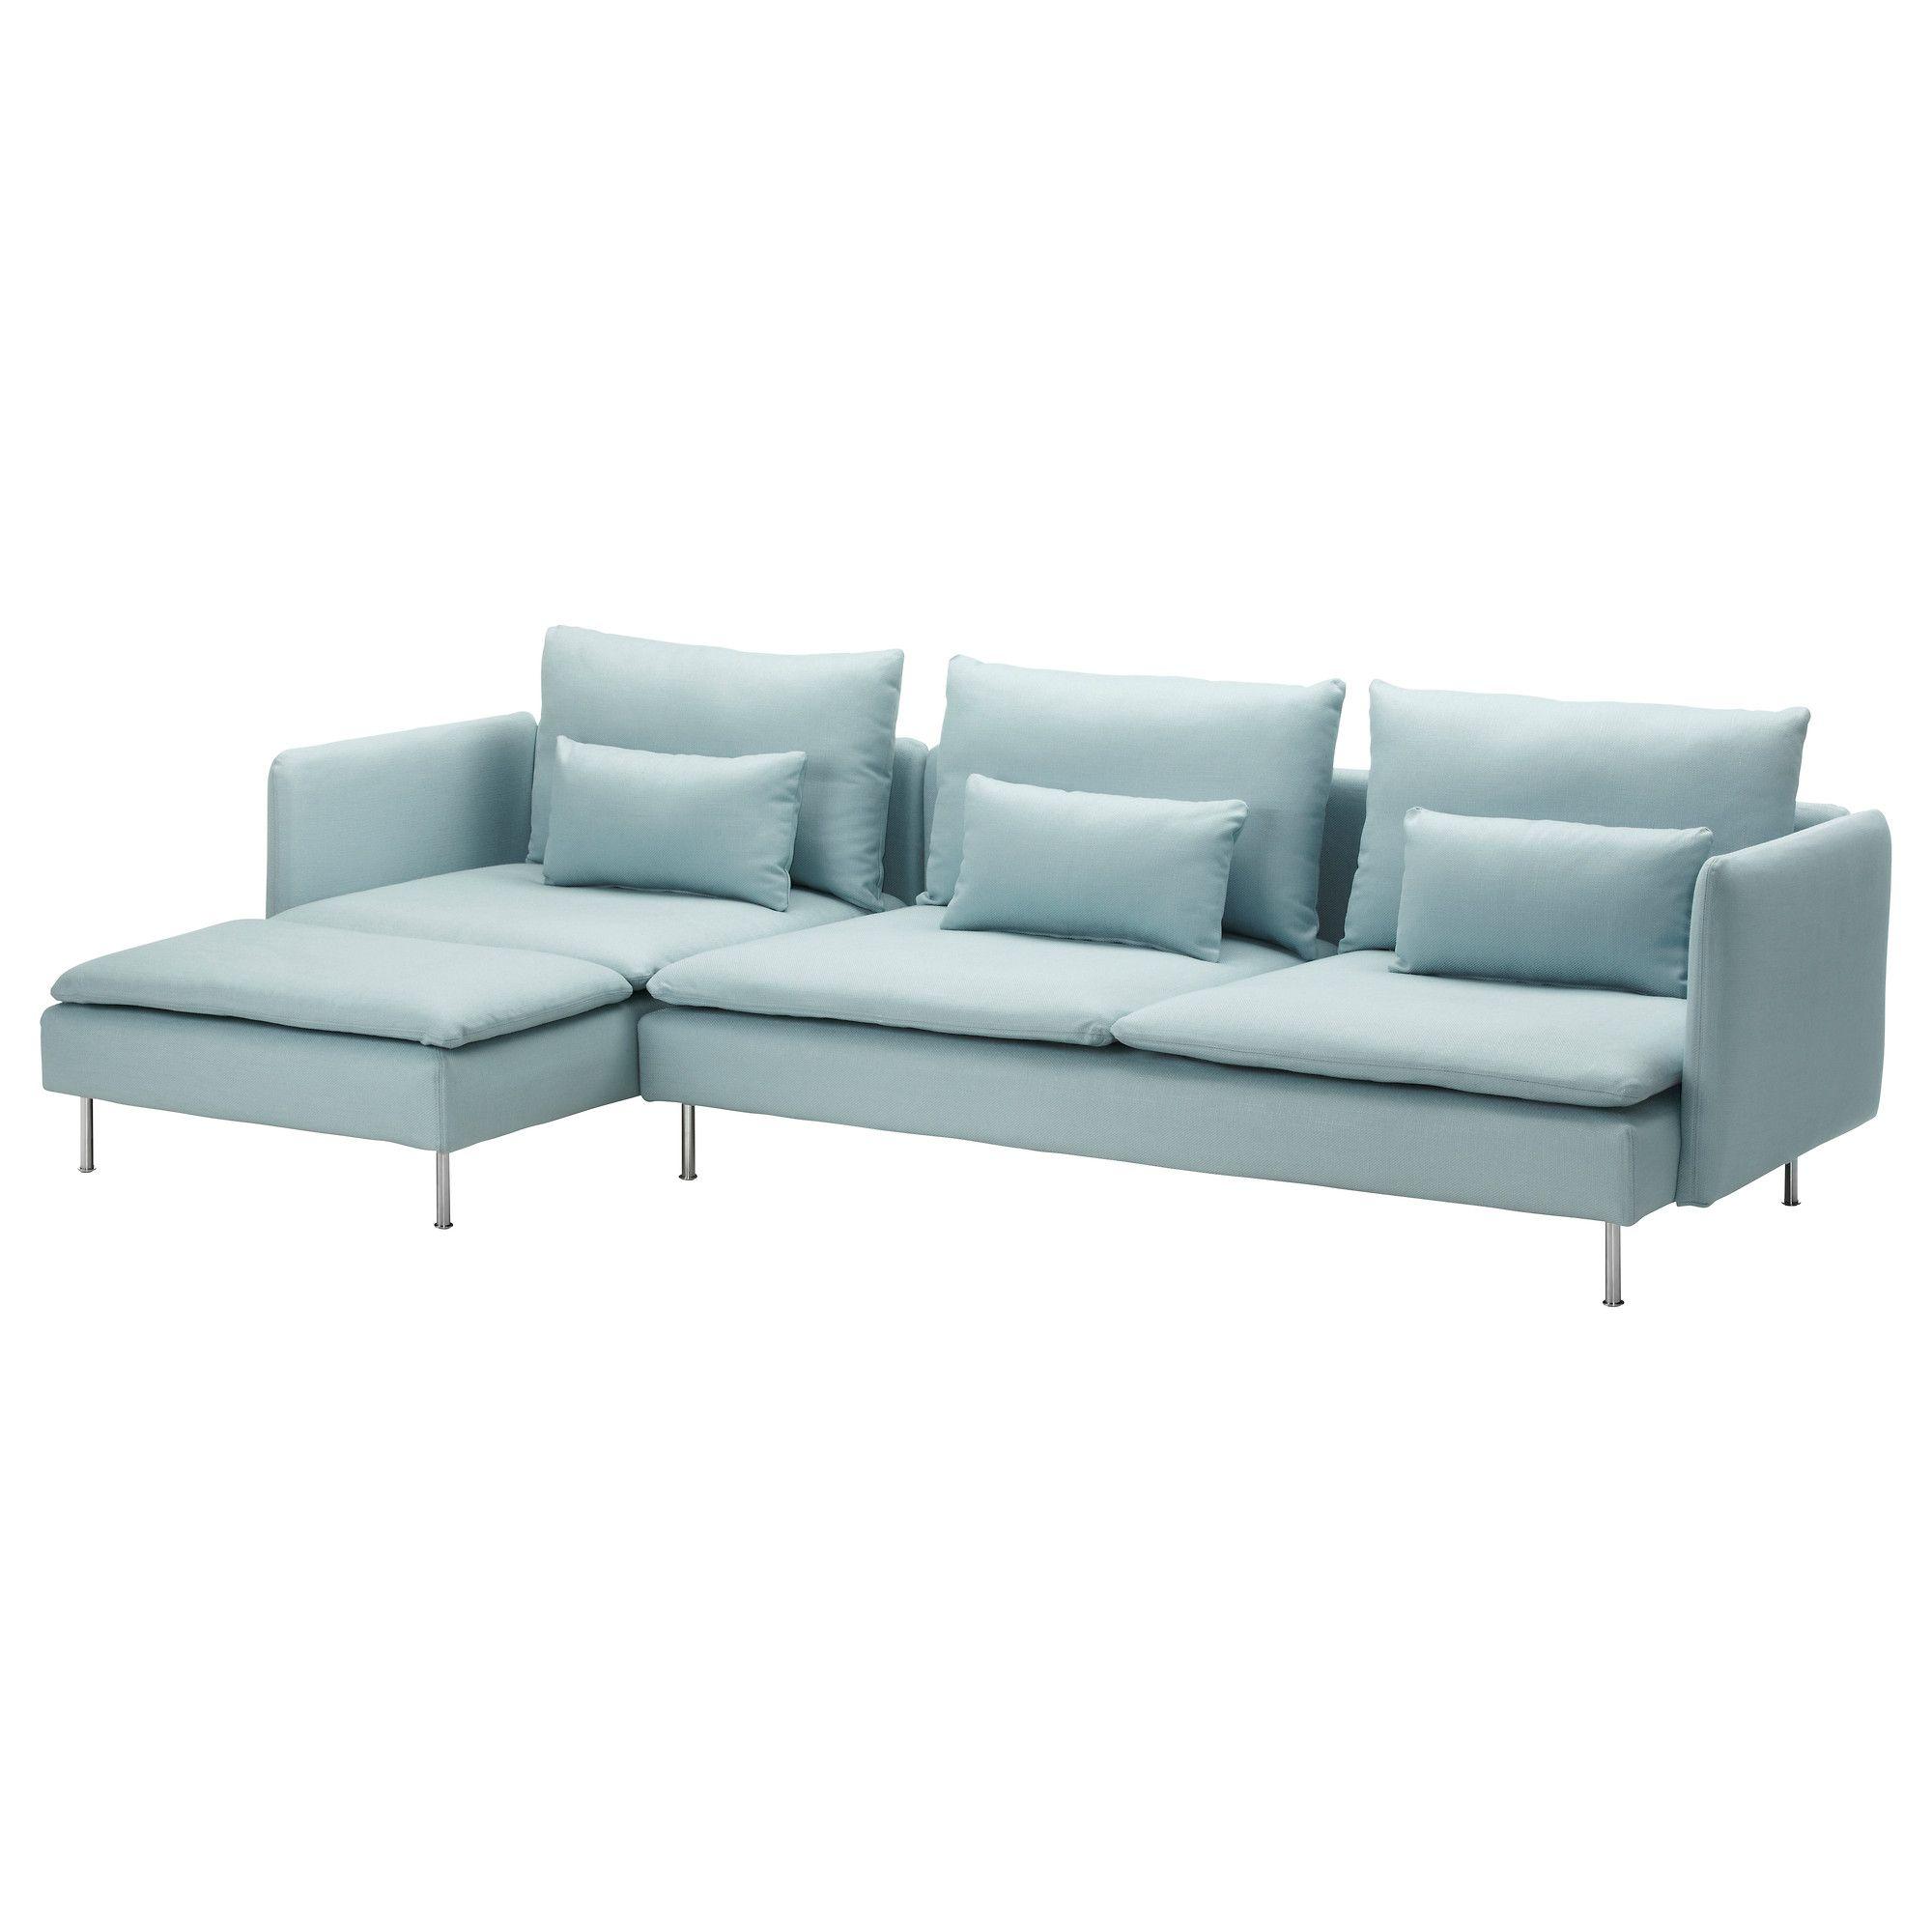 grey sofa chaise lounge flexsteel leather reclining latitudes sÖderhamn and samsta dark gray ikea